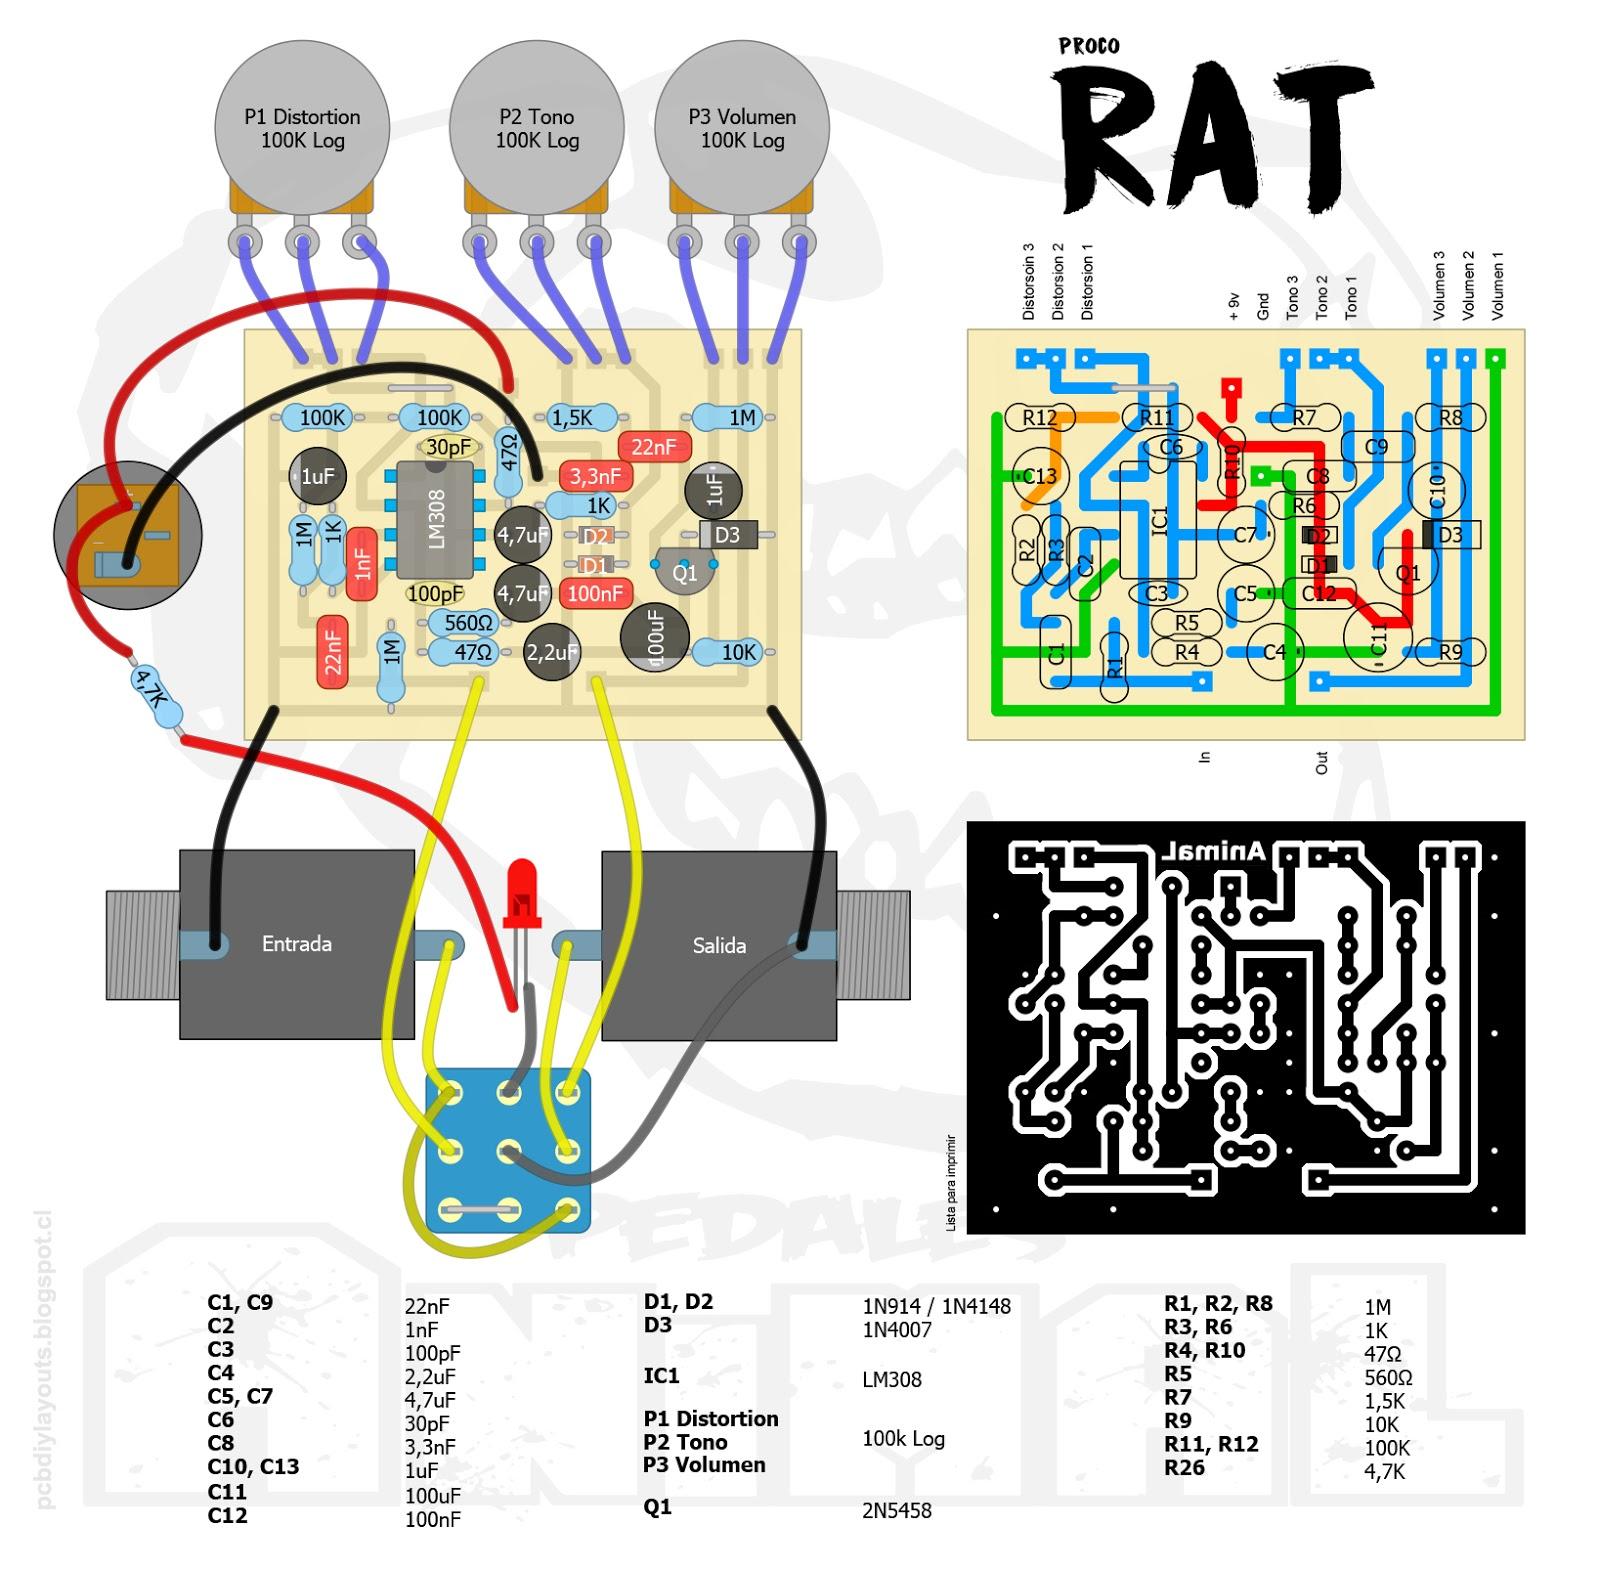 pcb diy layouts  proco rat